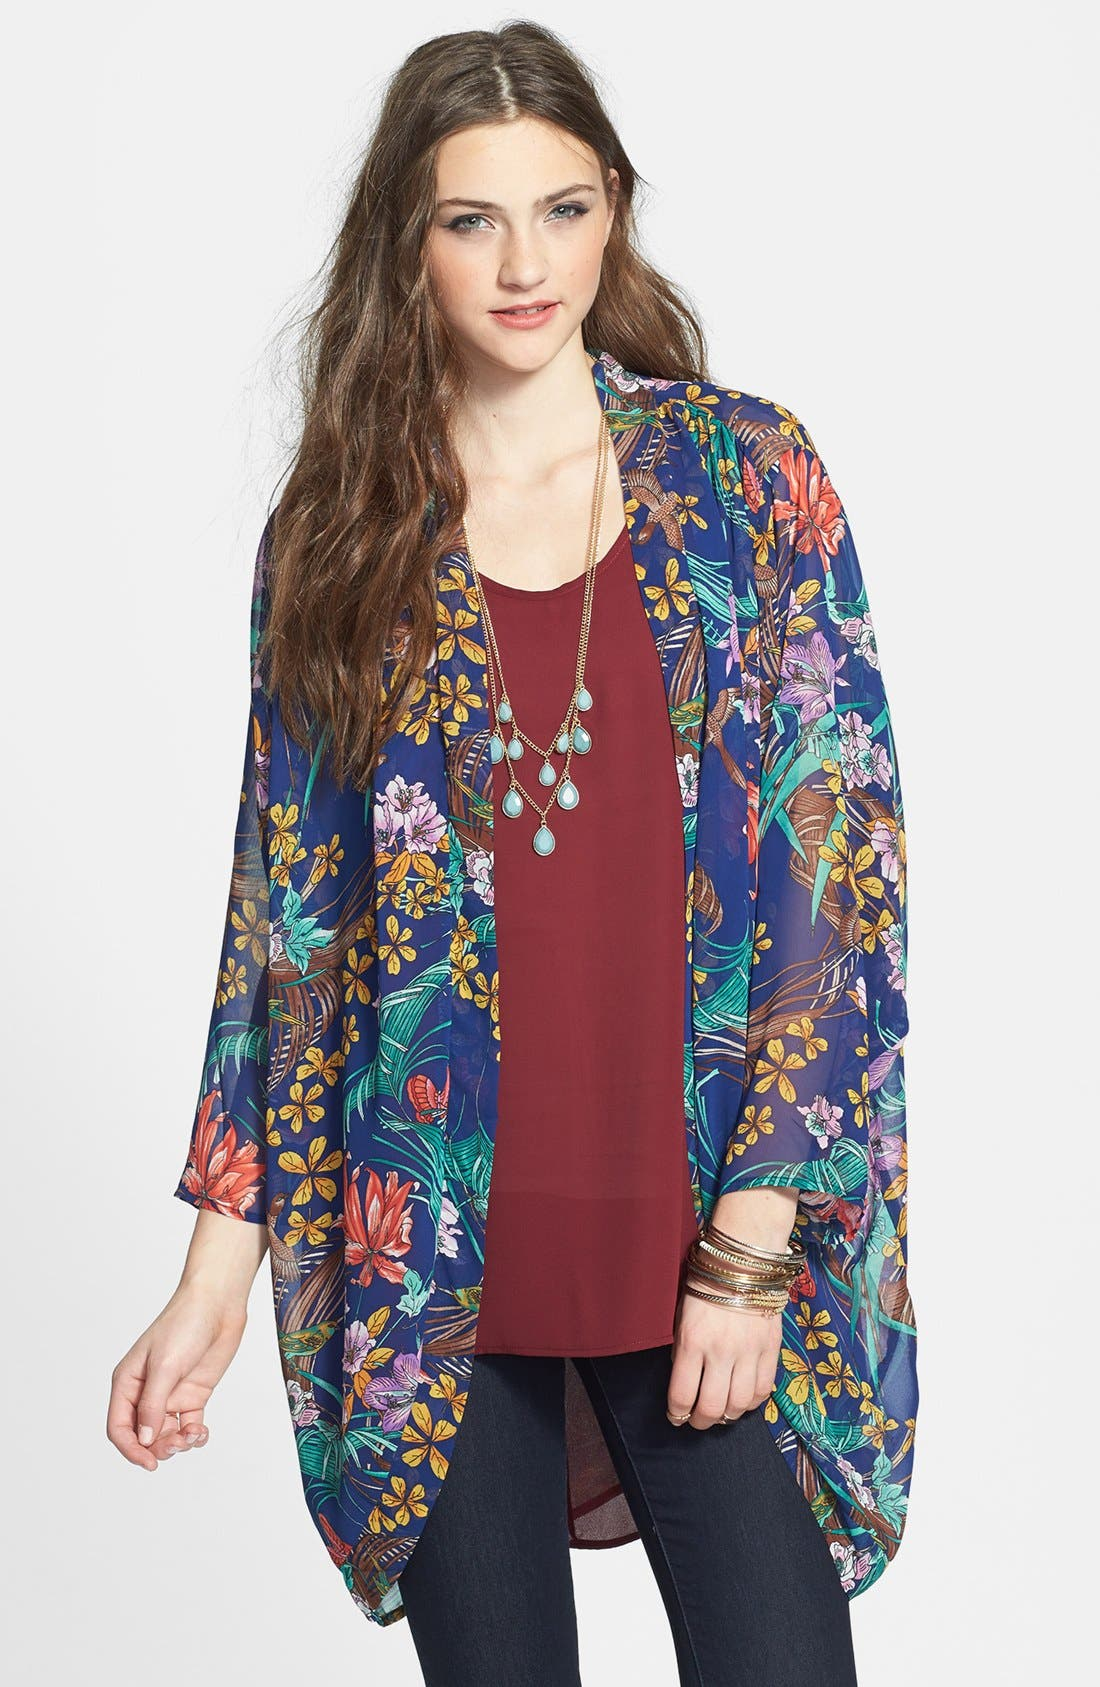 Alternate Image 1 Selected - Hot & Delicious Floral Chiffon Kimono Jacket (Juniors)